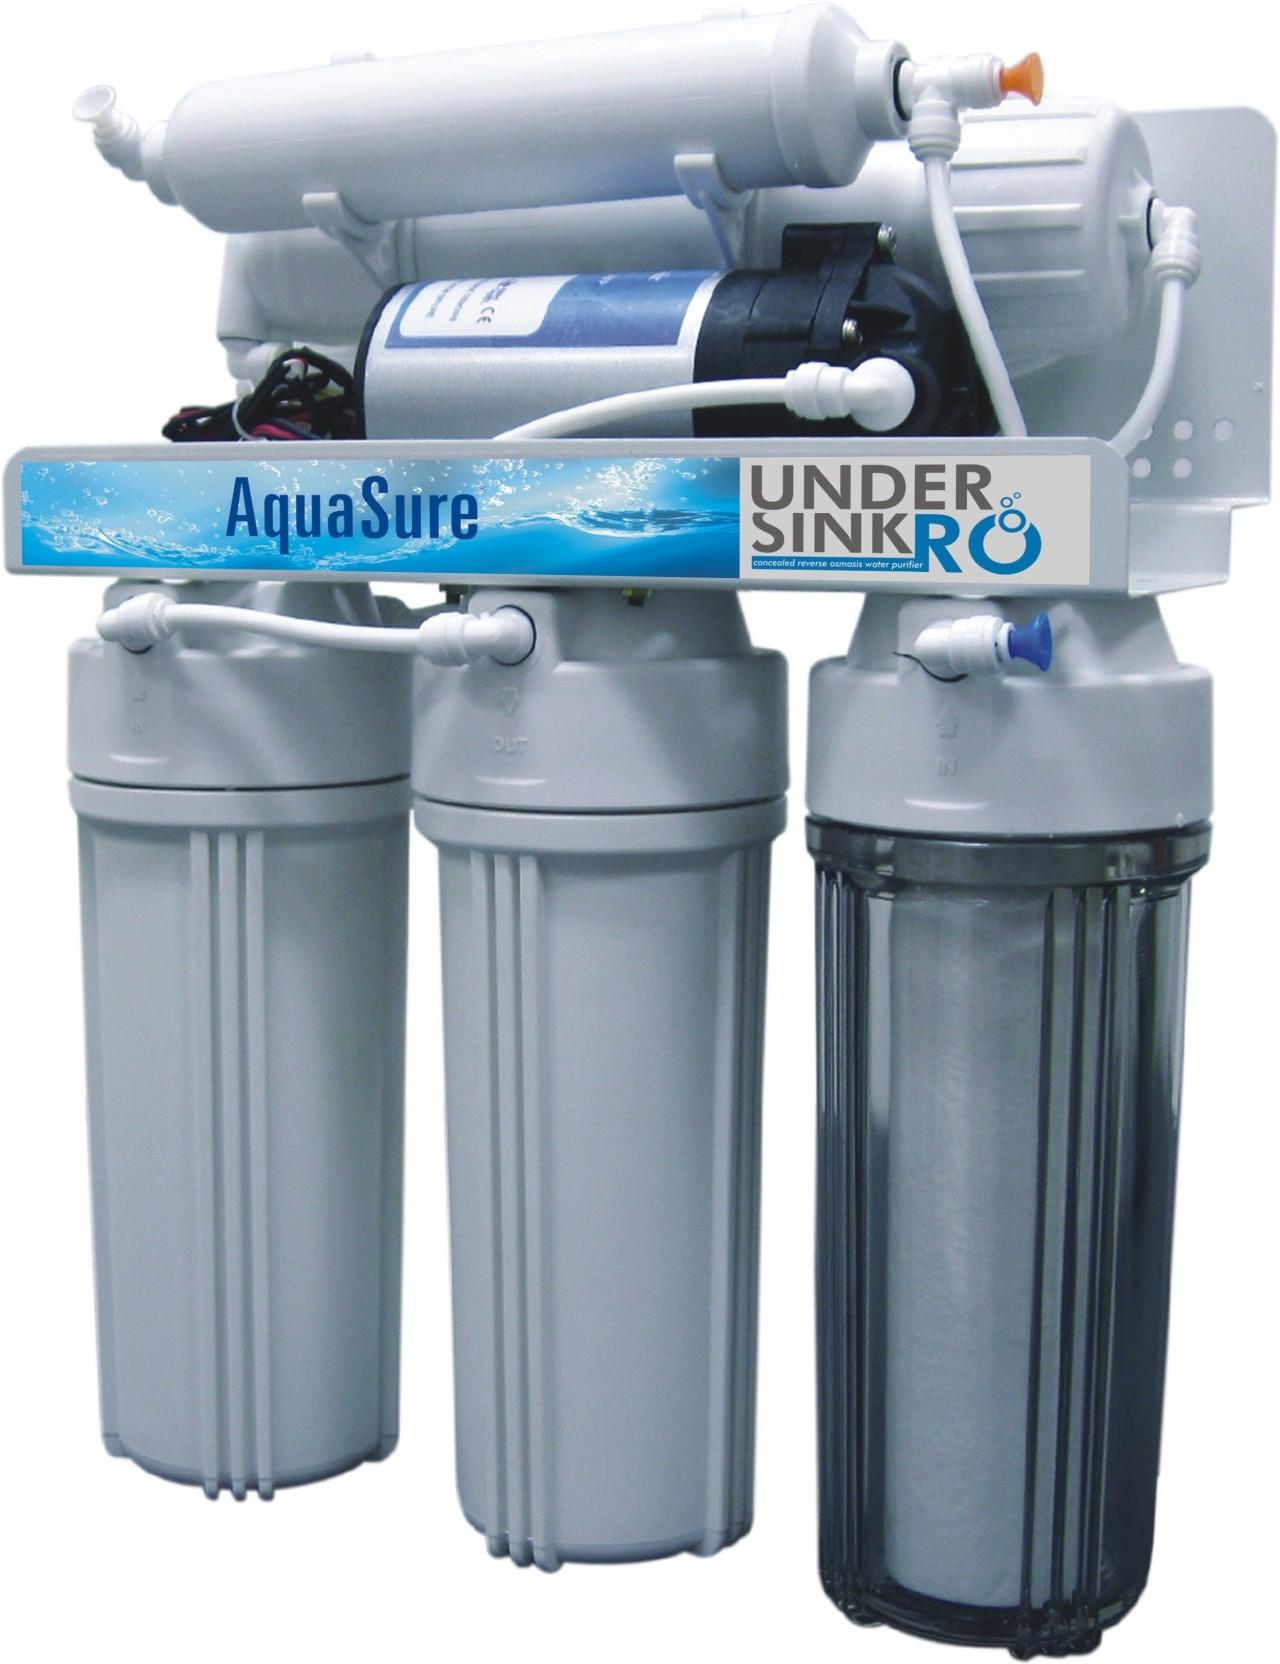 Eureka Forbes Aquasure Under Sink RO 14 L RO Water Purifier - Eureka ...